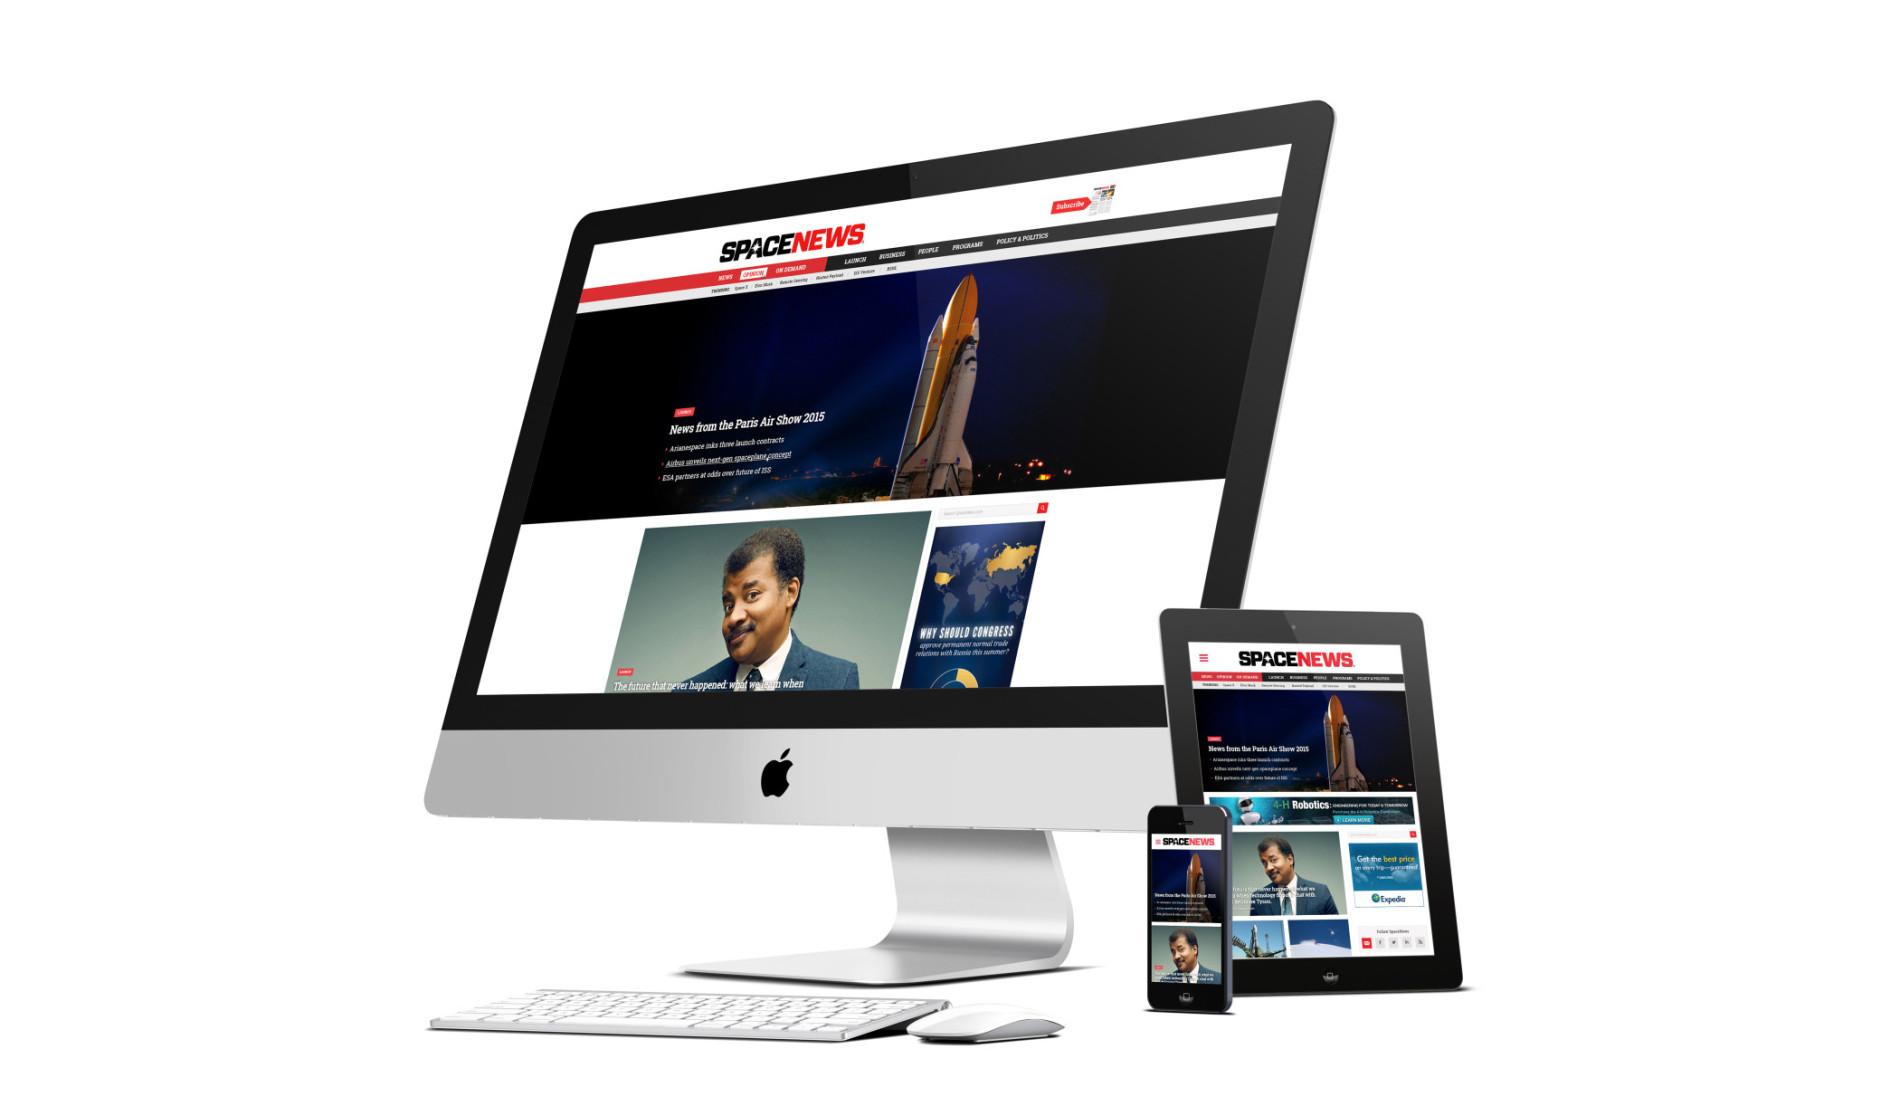 Spacenews responsive design comps